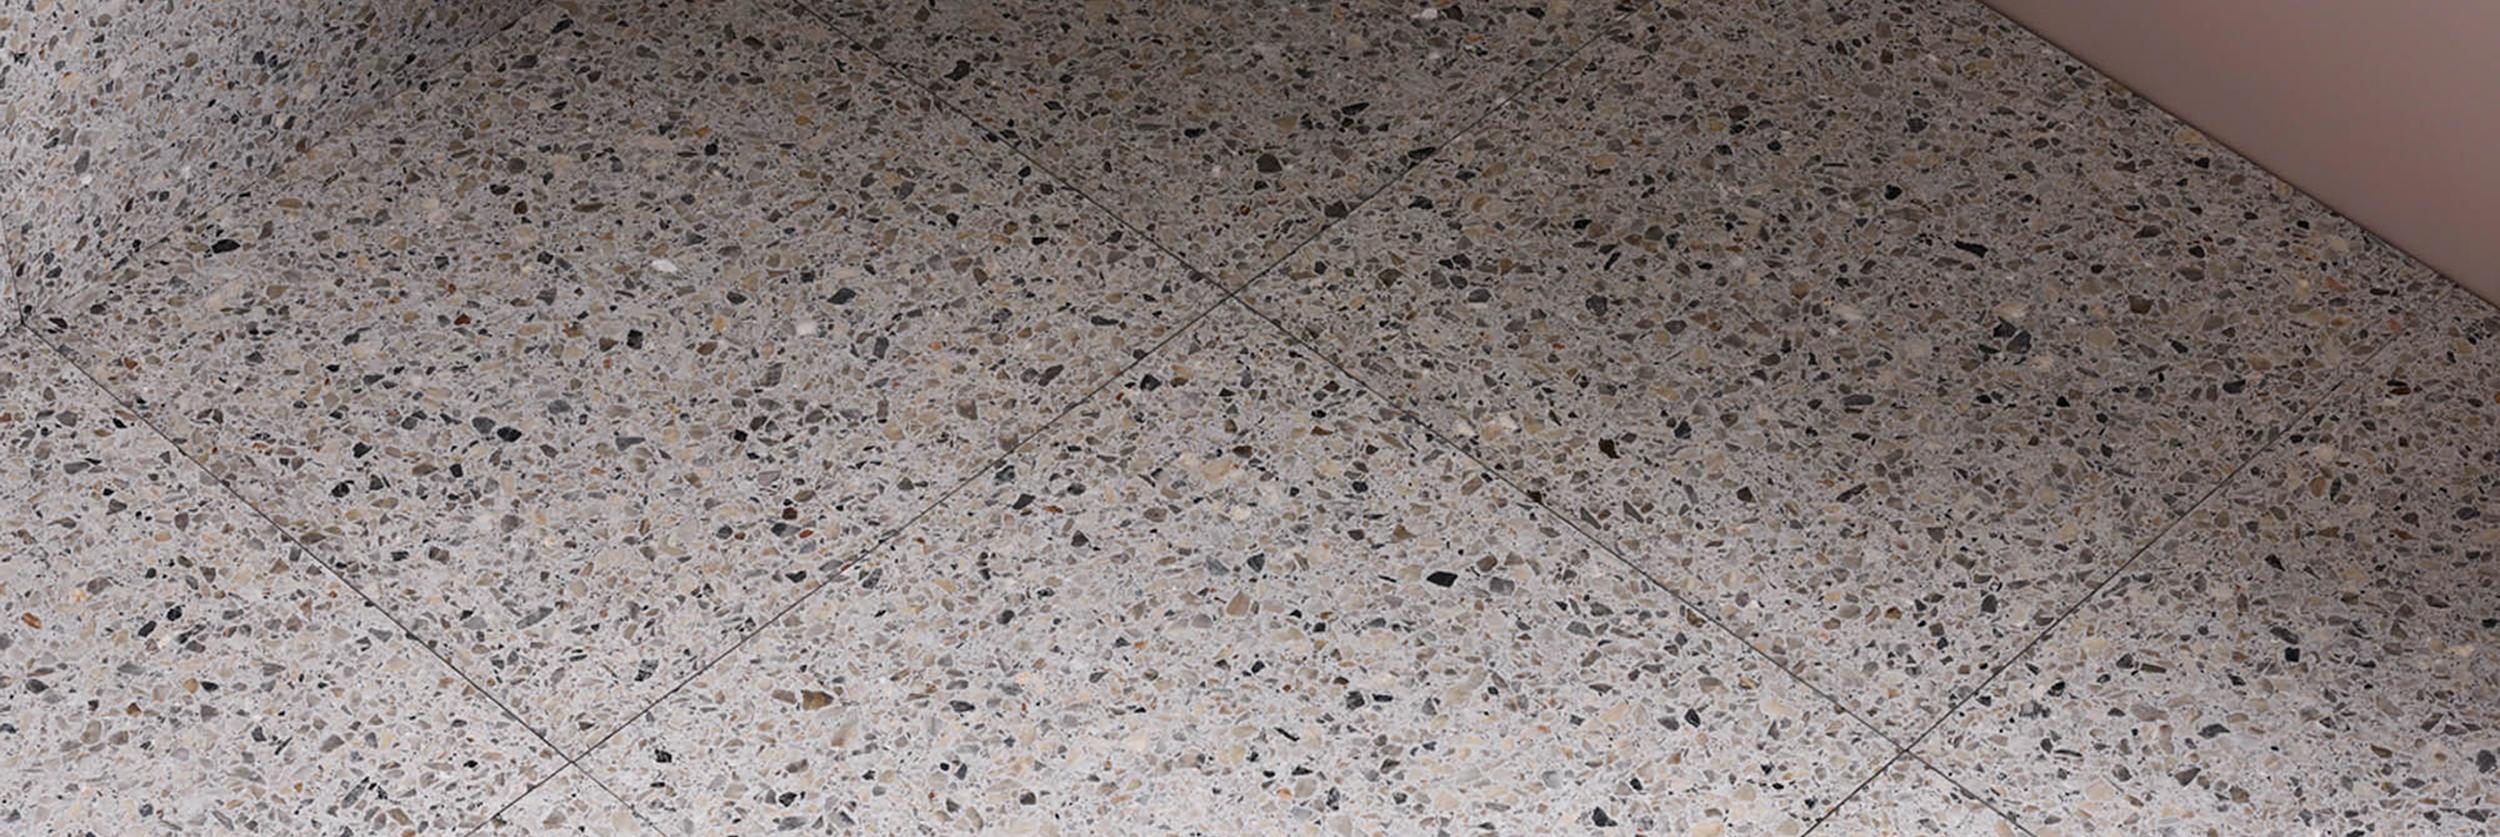 TERRAZZO TILES – Adelaide Tiles, benchtops adelaide, Caesar Stone